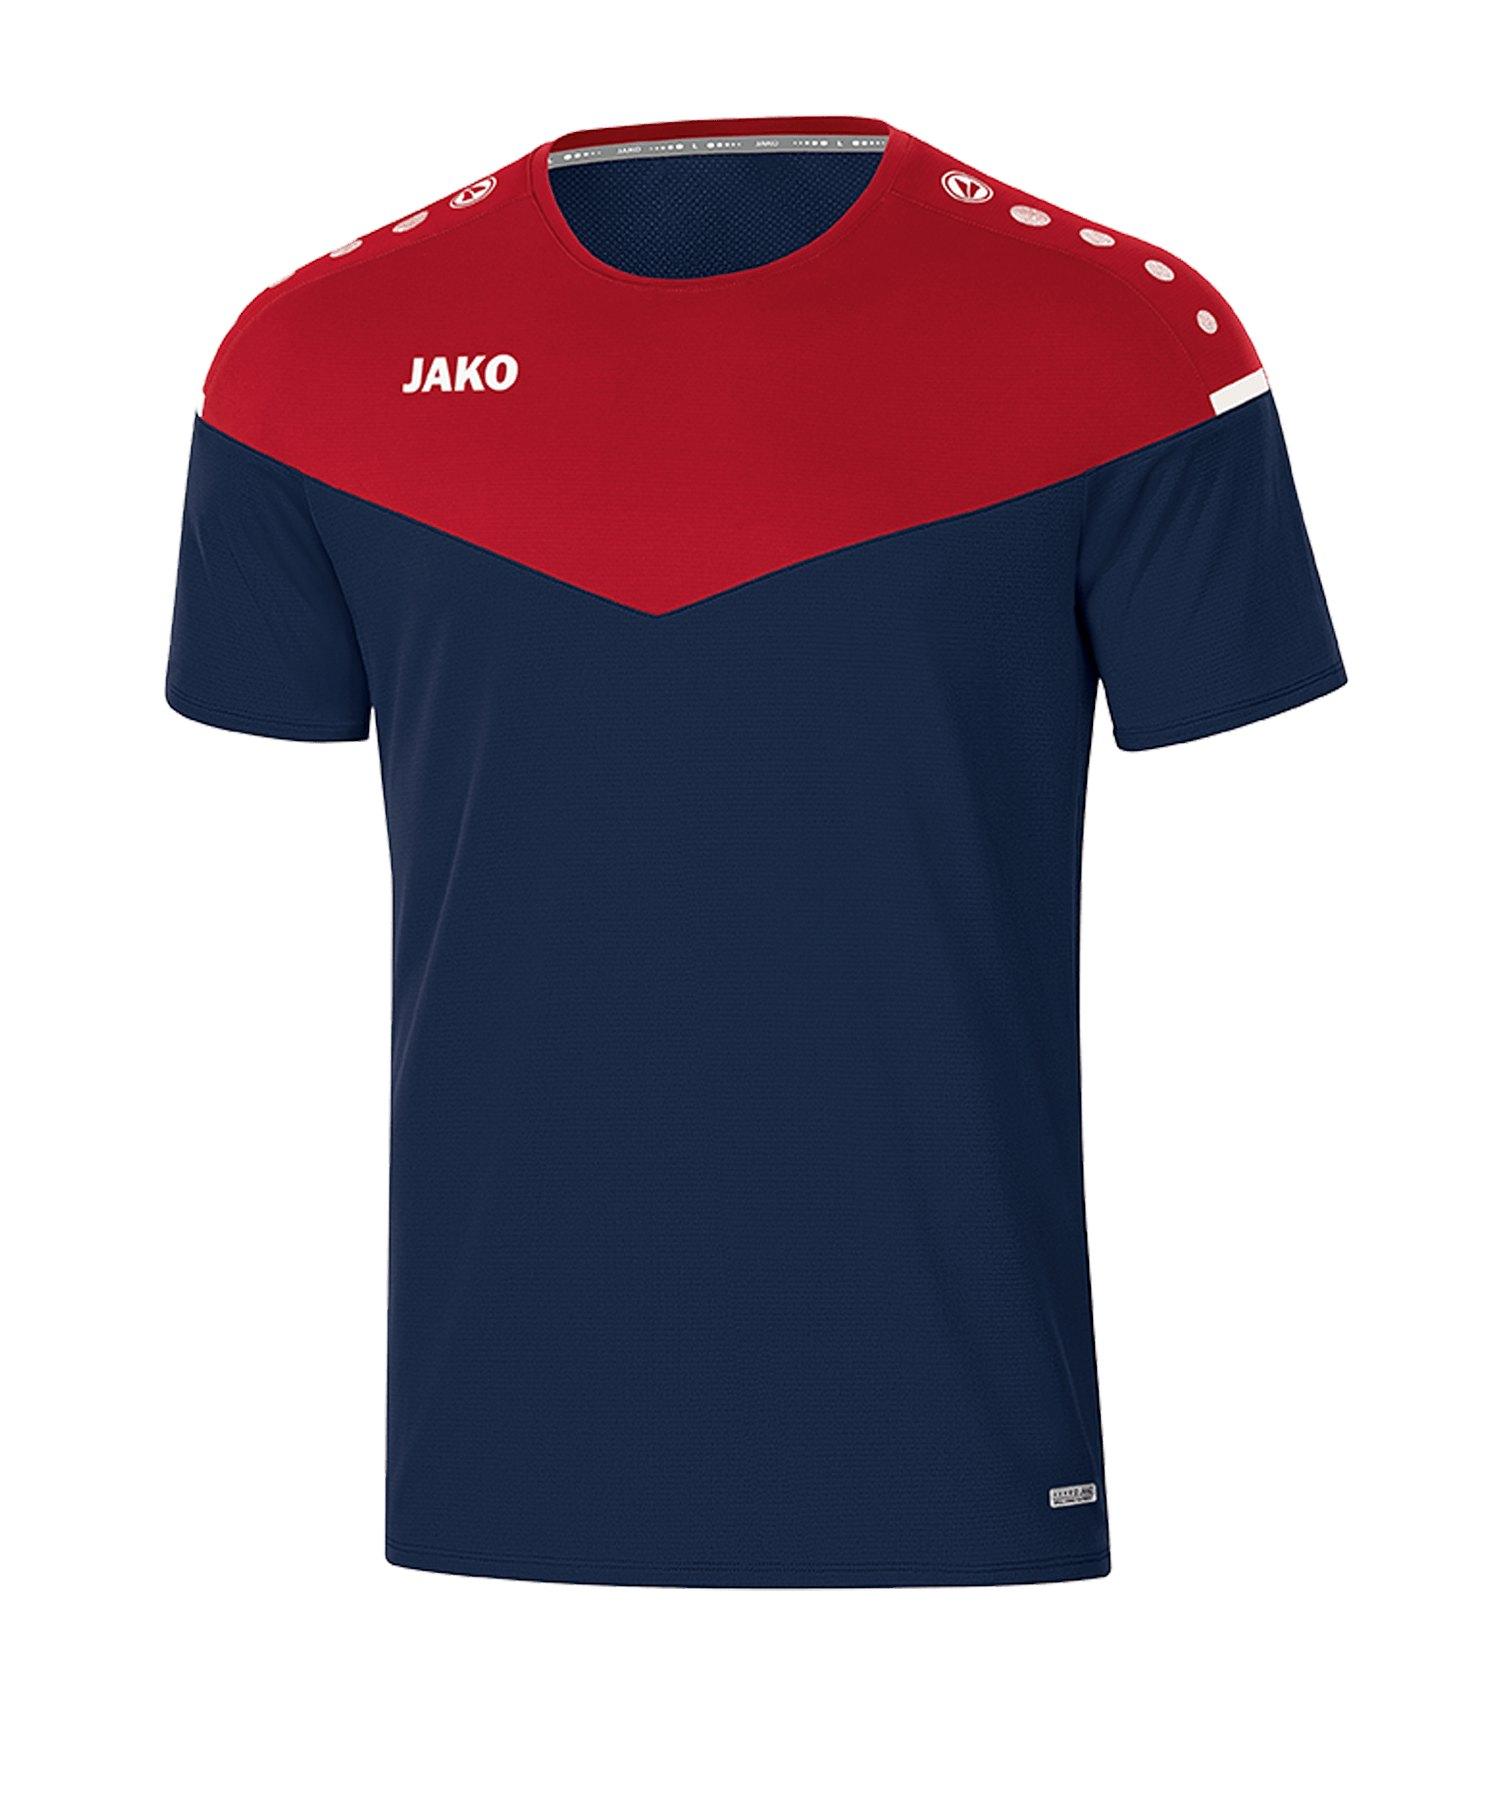 Jako Champ 2.0 T-Shirt Damen Blau F91 - blau